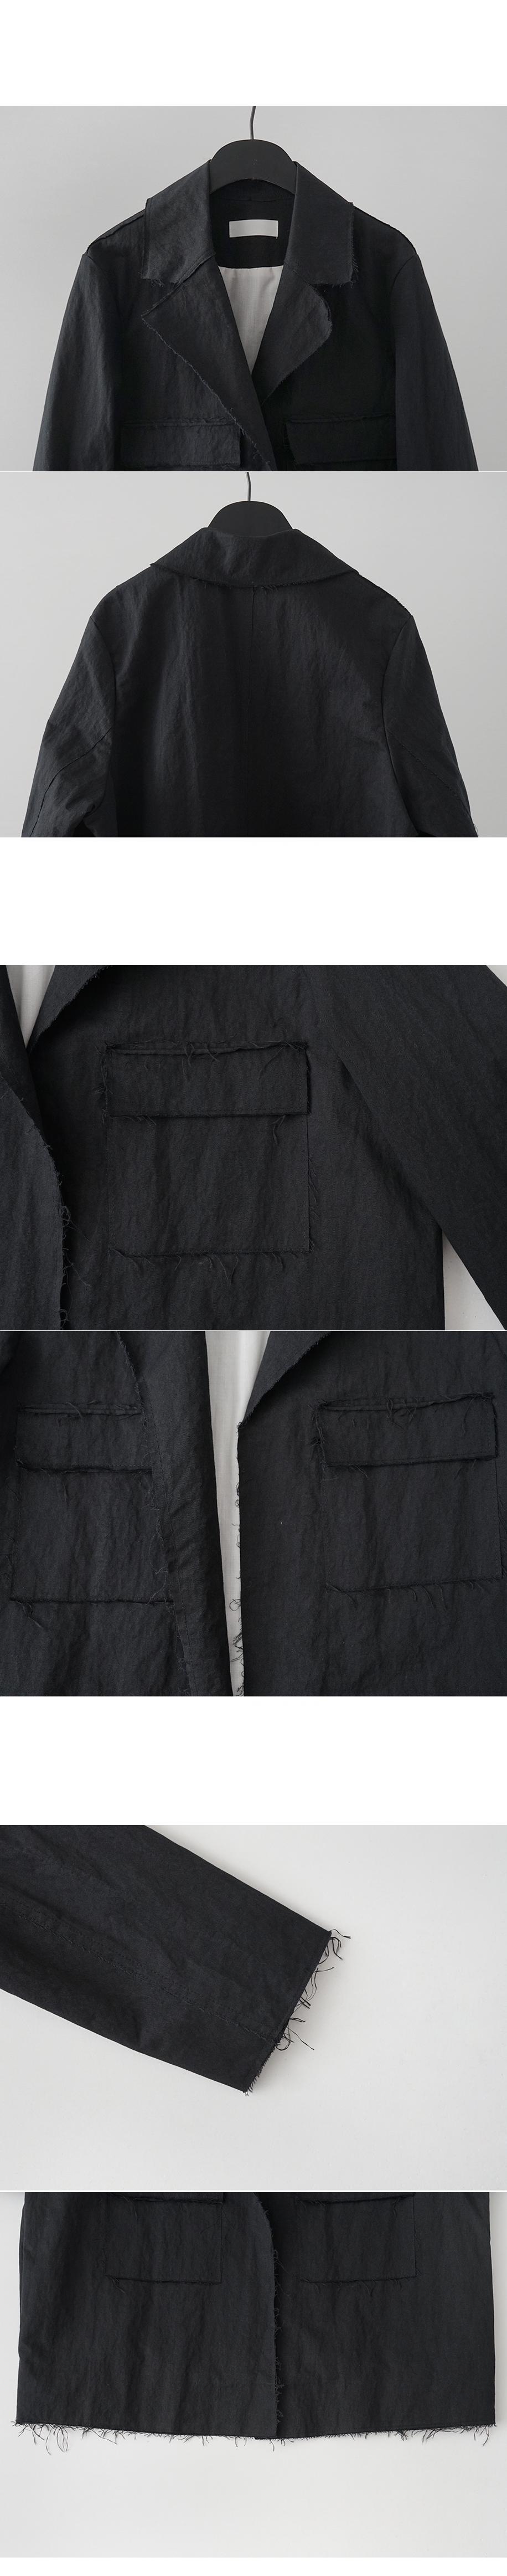 non button cutting jacket